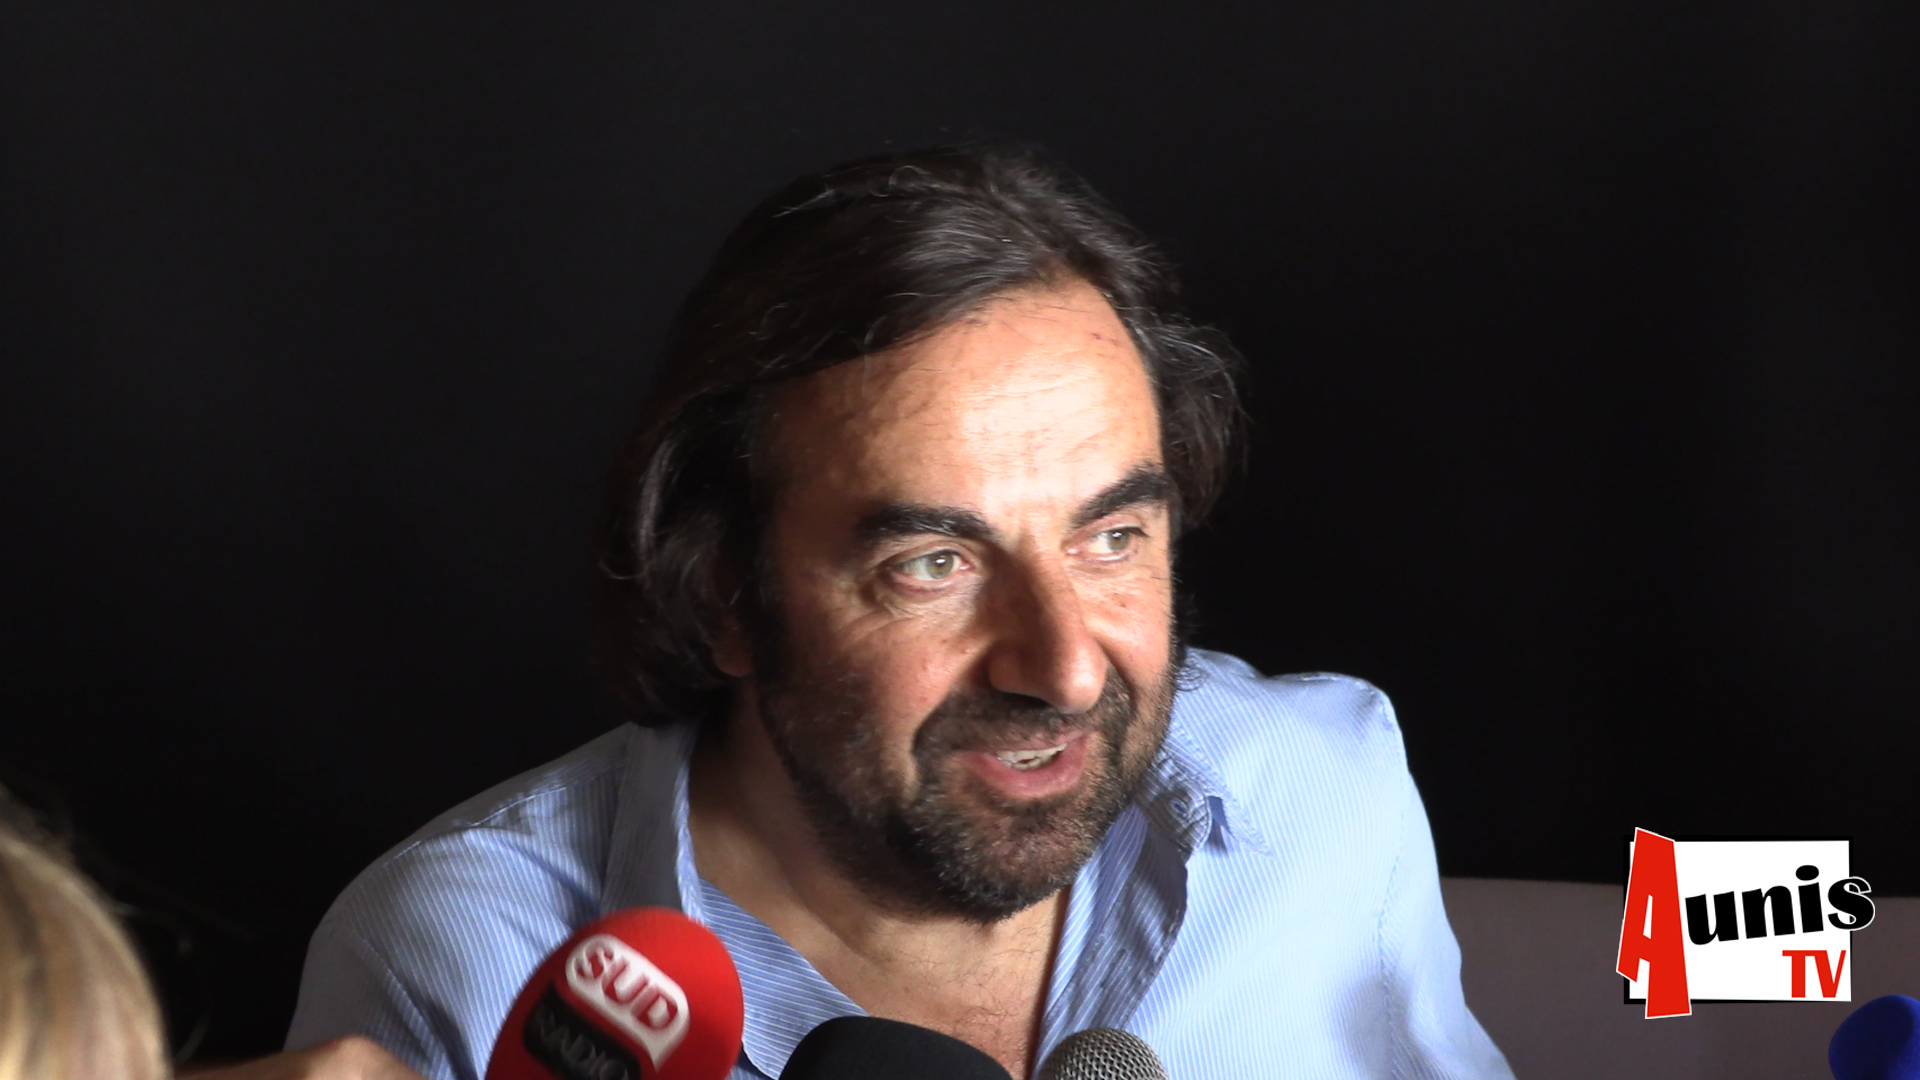 Francofolies La Rochelle. André Manoukian